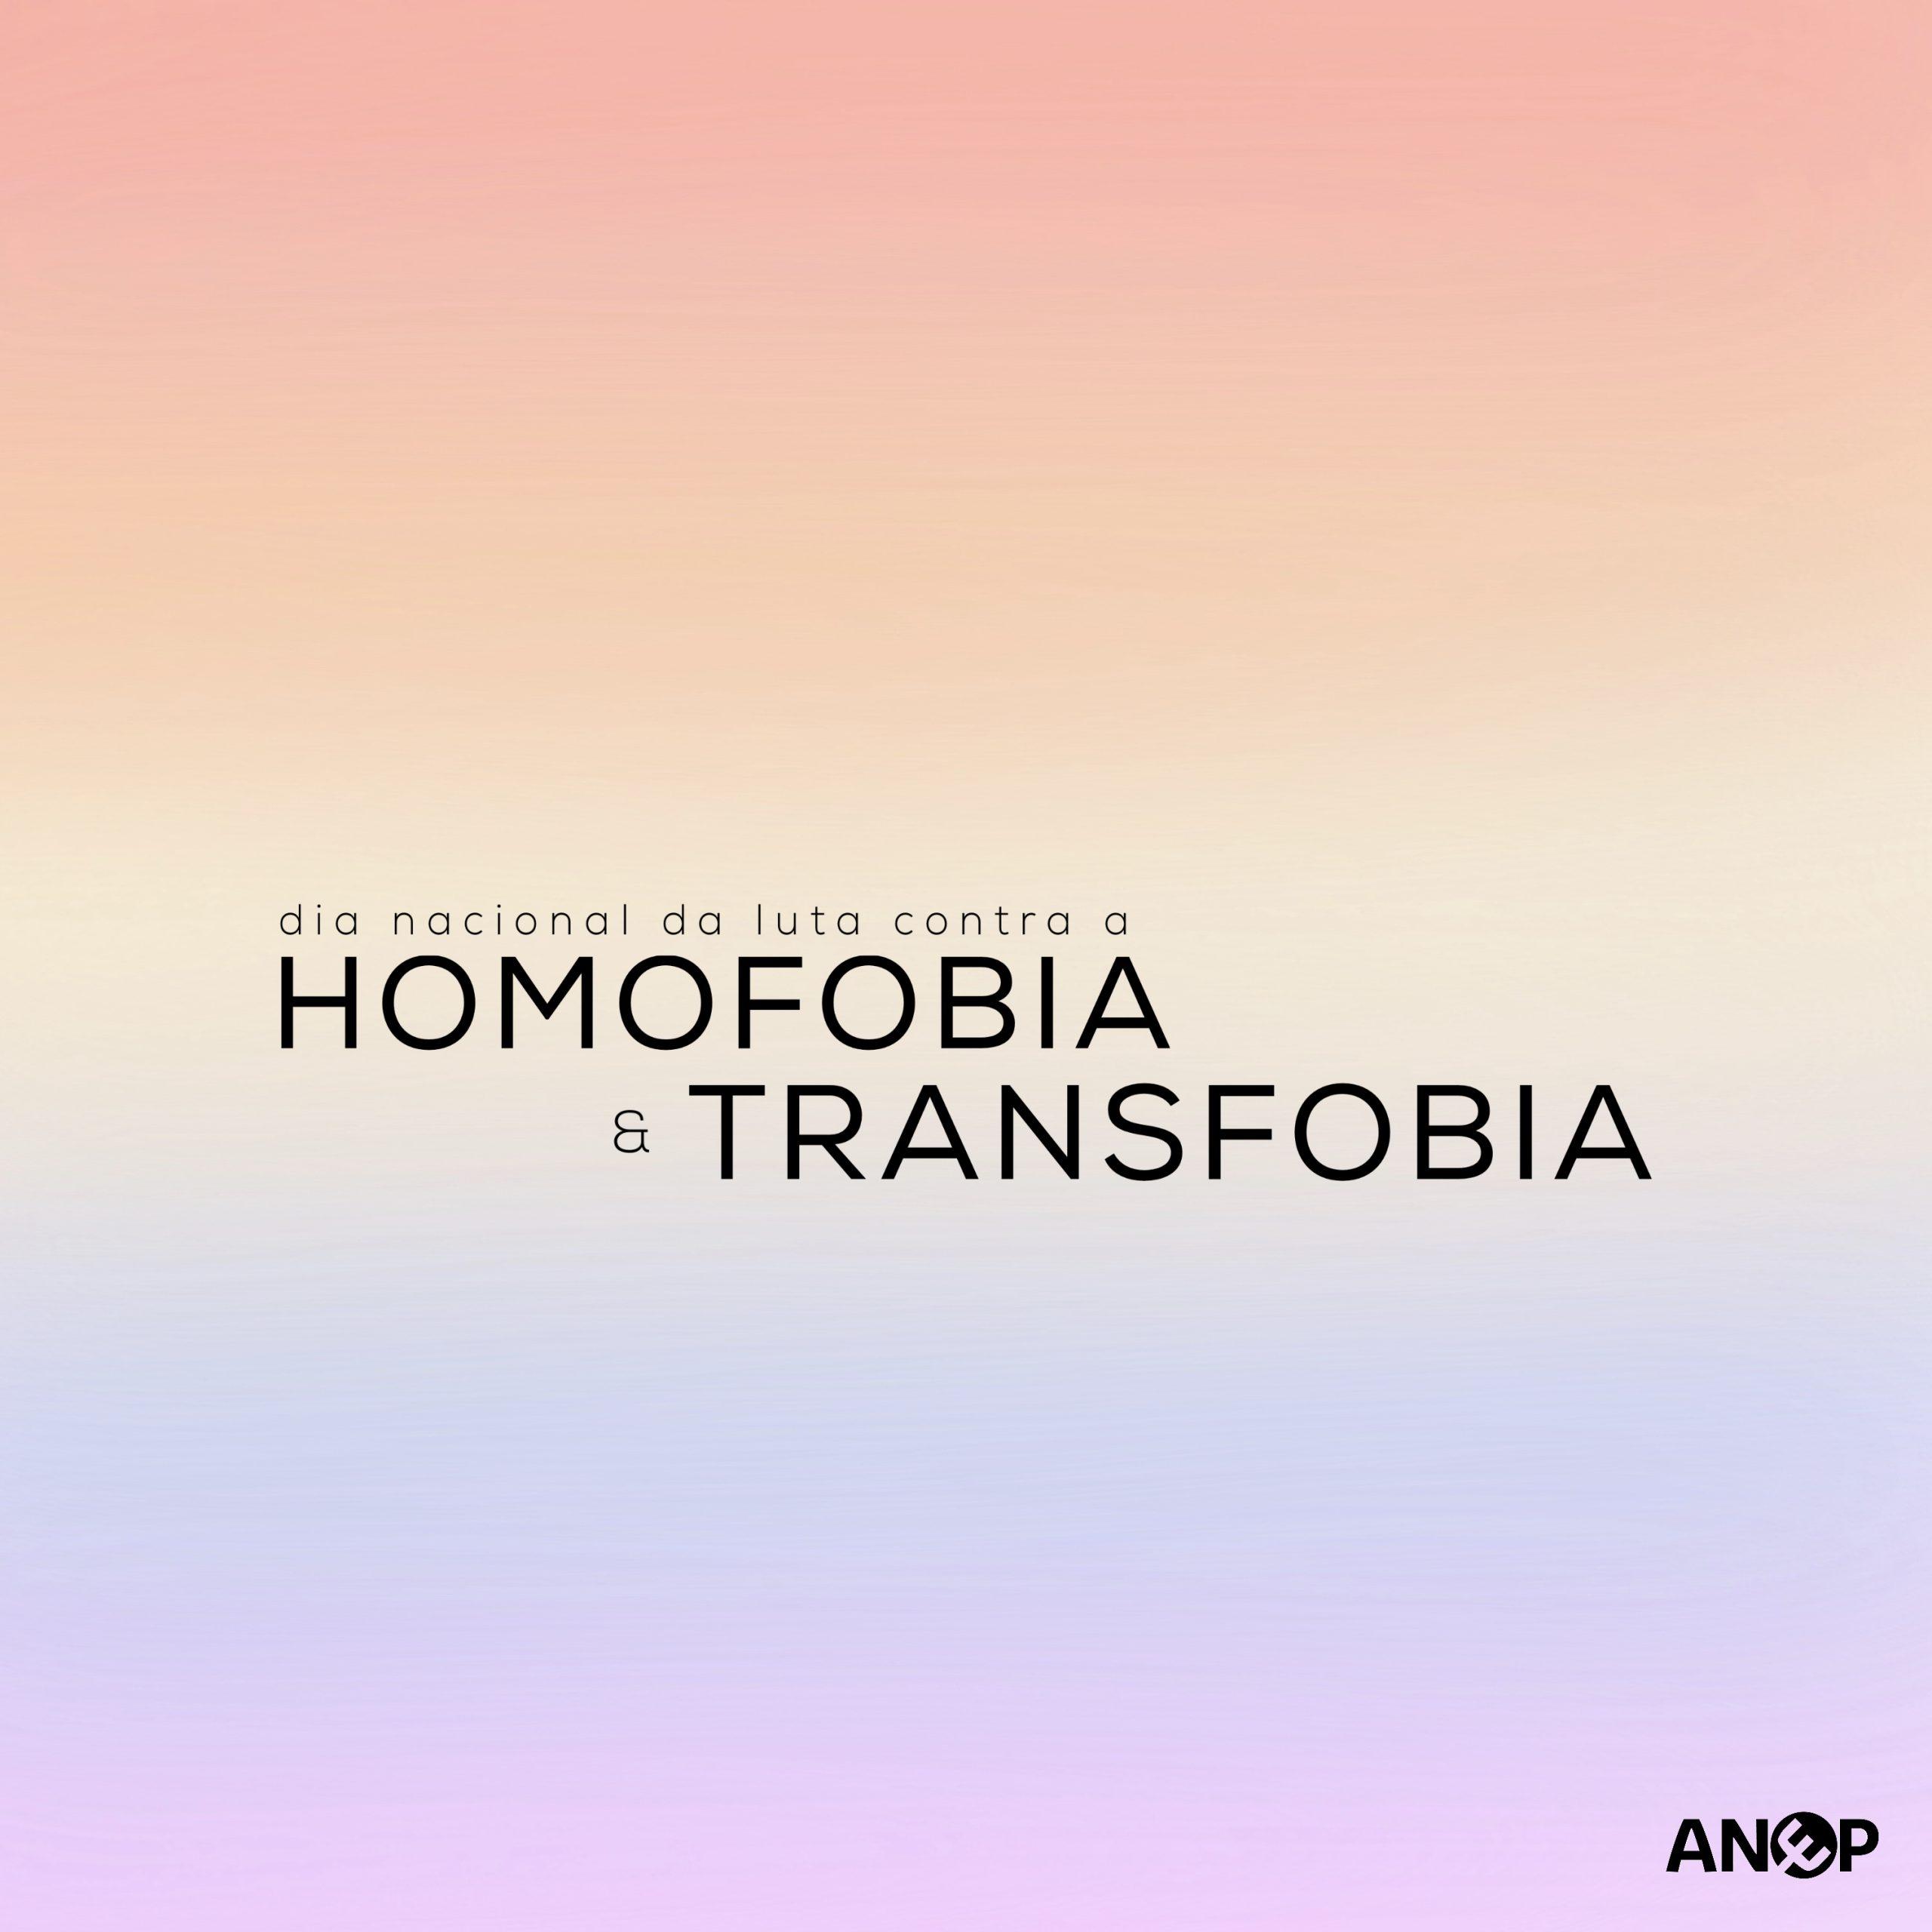 Homofobia_Transfobia